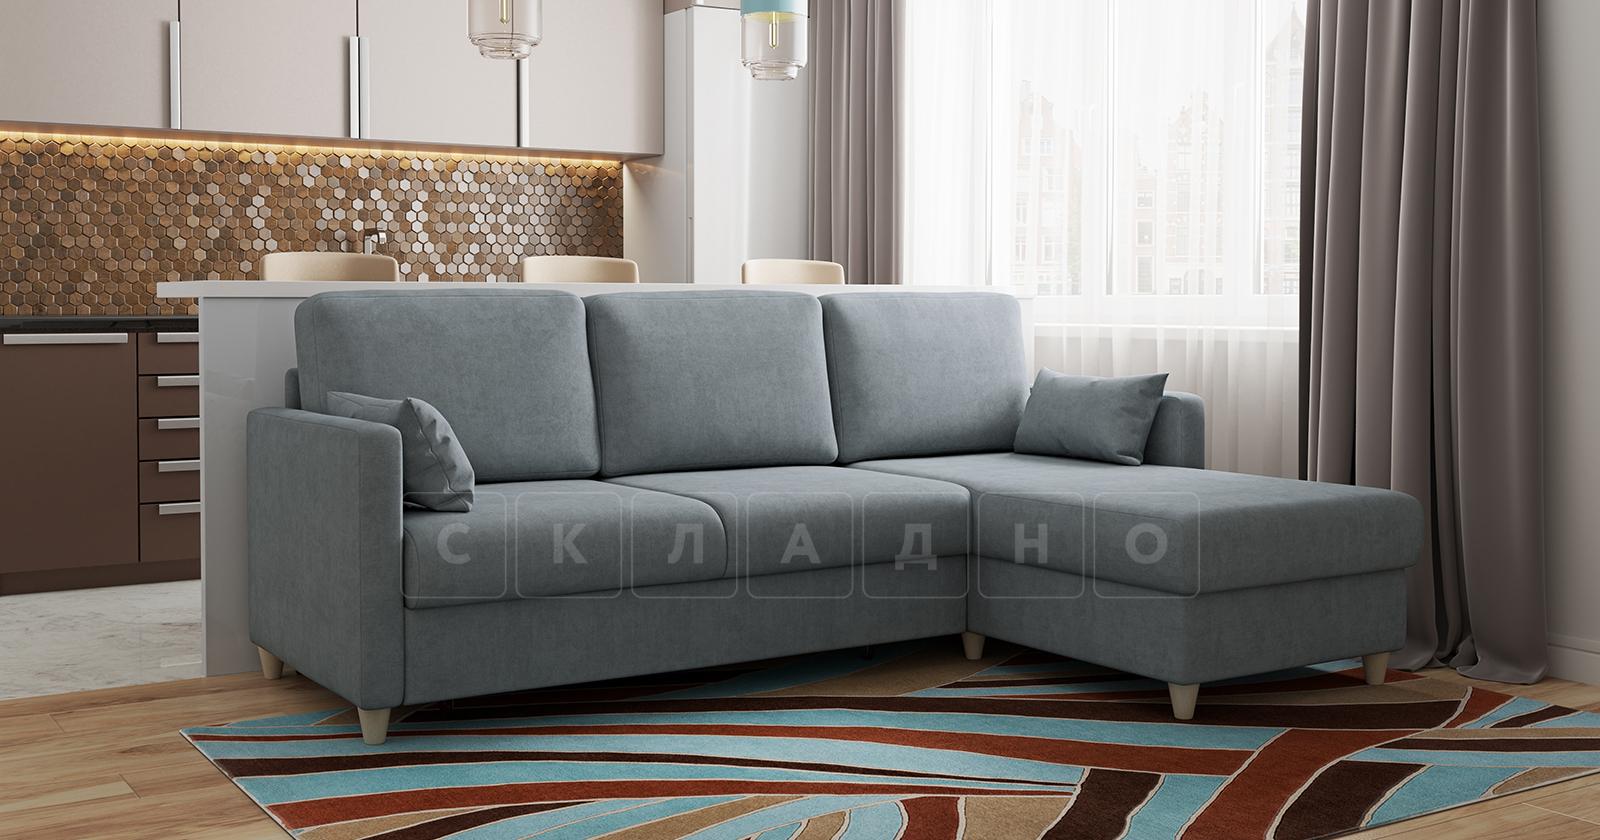 Угловой диван Дарвин серый фото 17 | интернет-магазин Складно